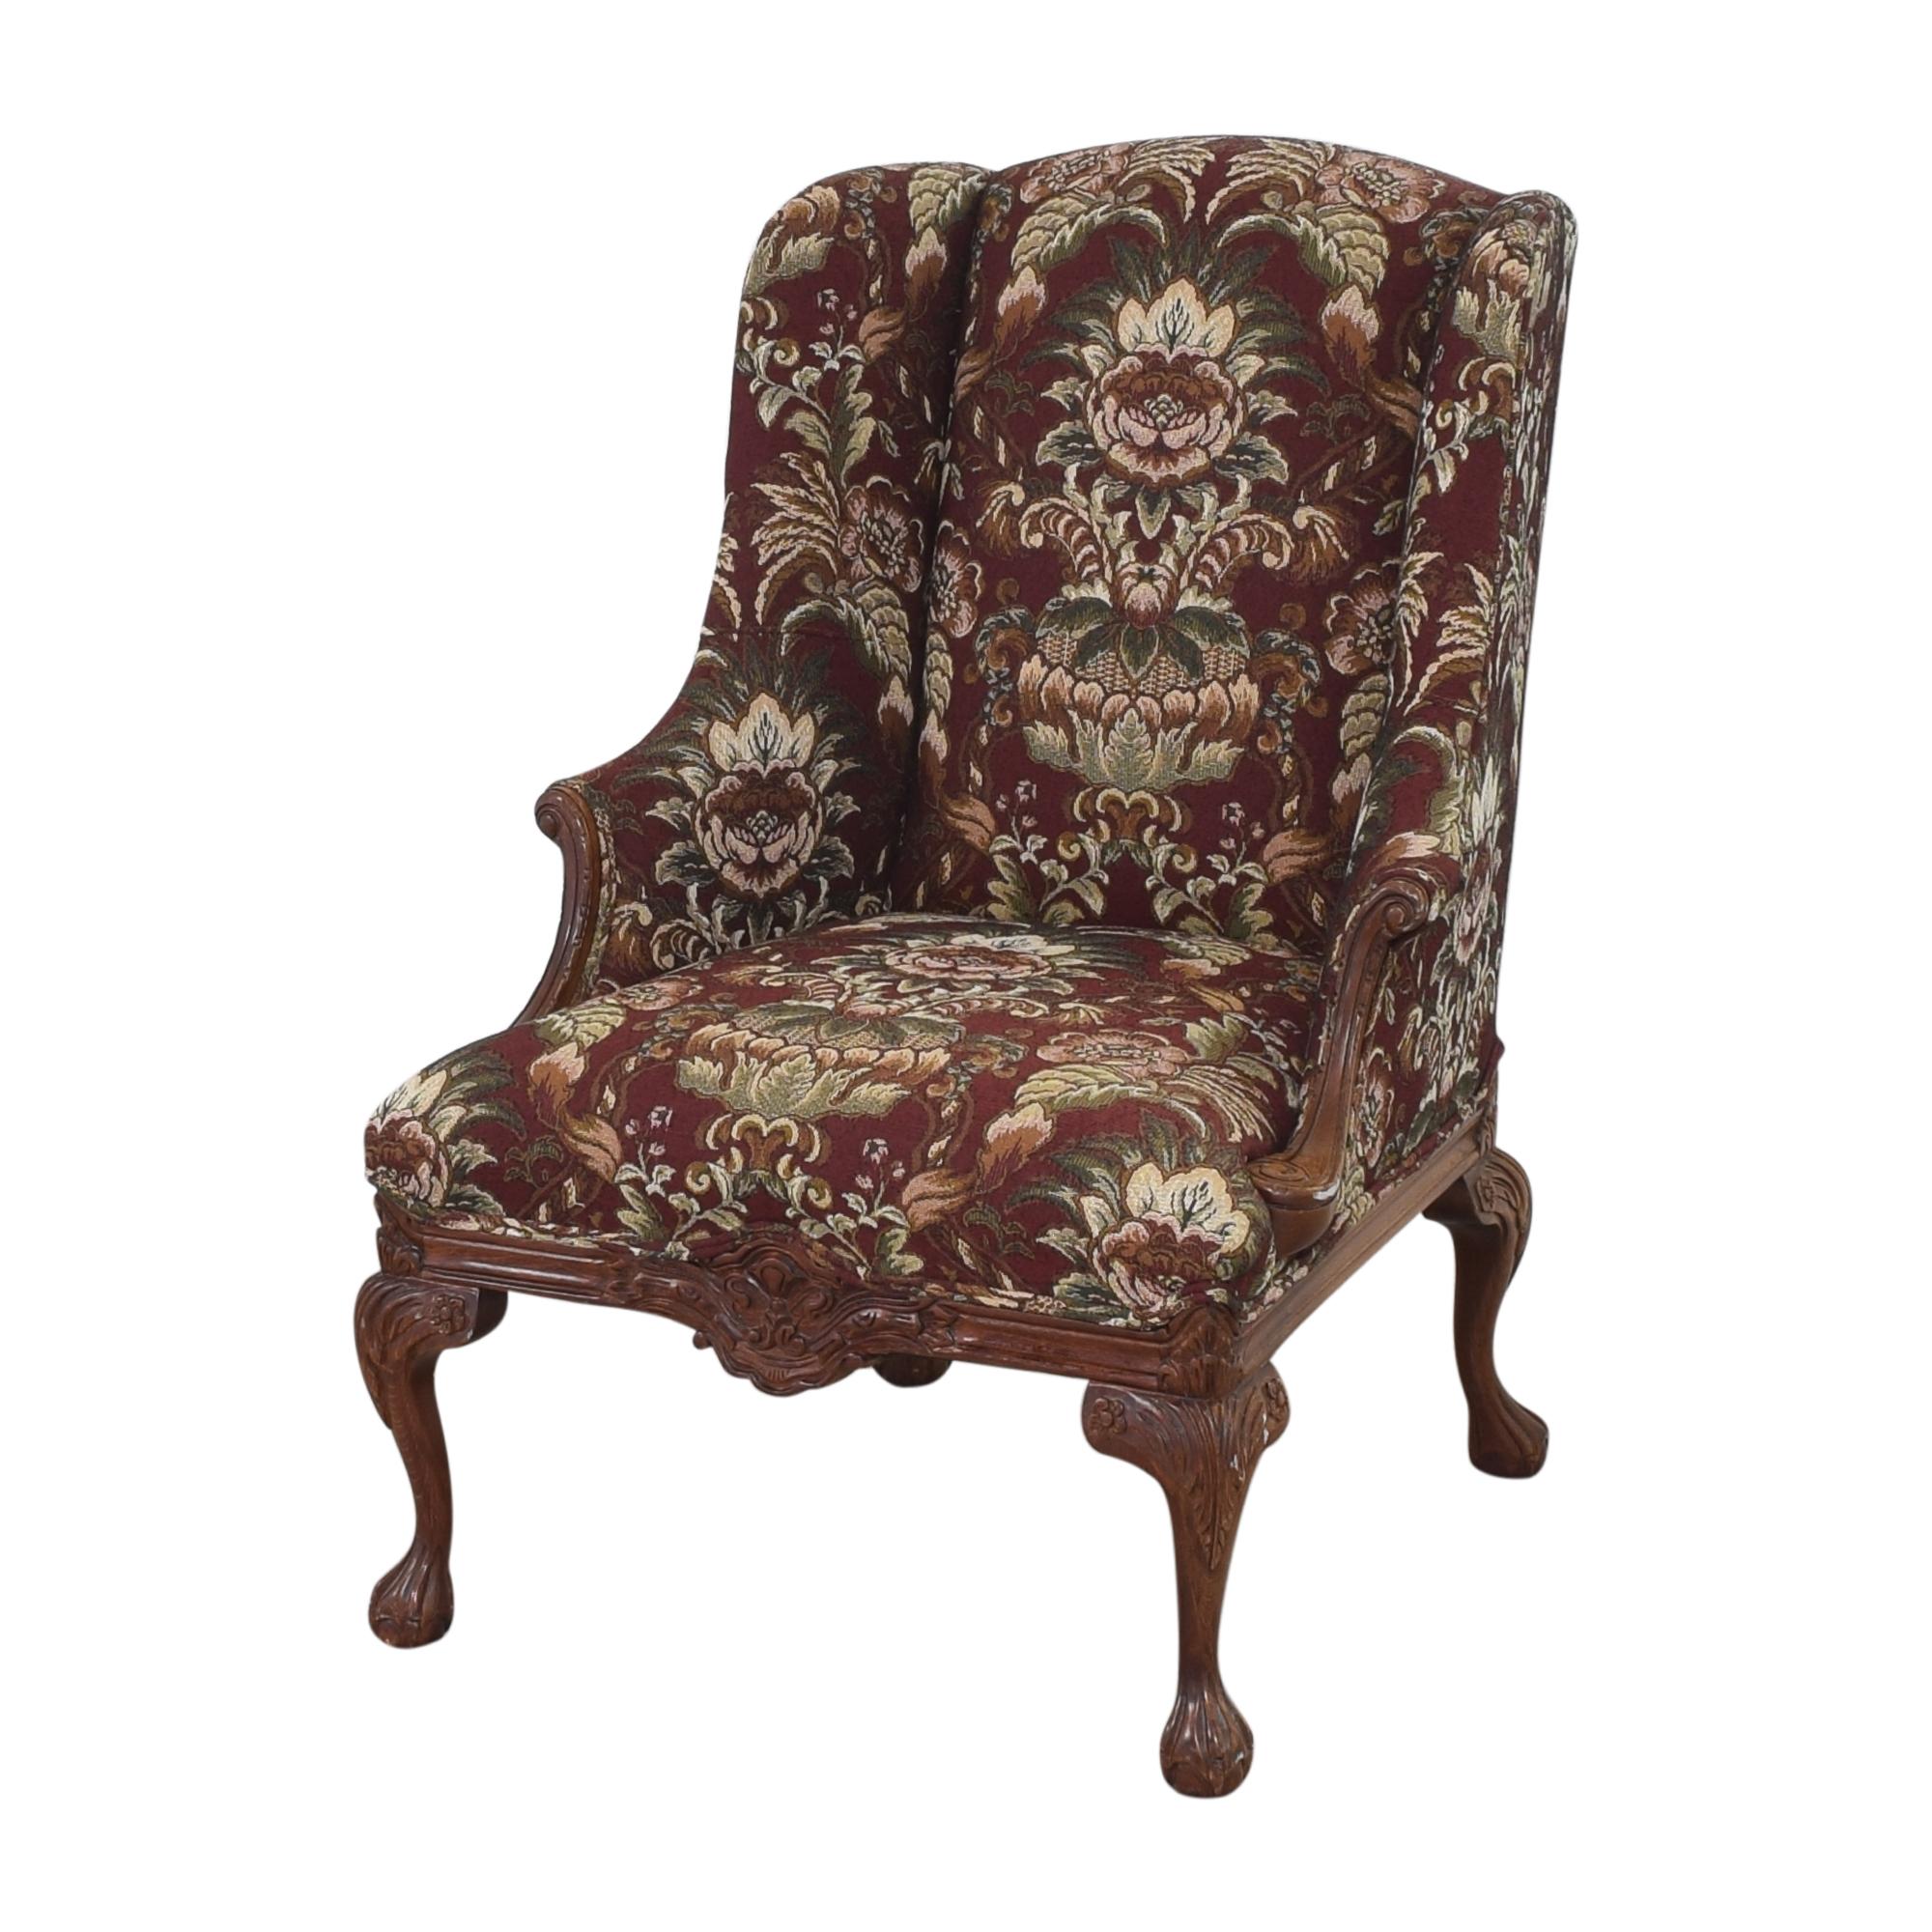 shop Drexel Heritage Wing Back Floral Chair Drexel Heritage